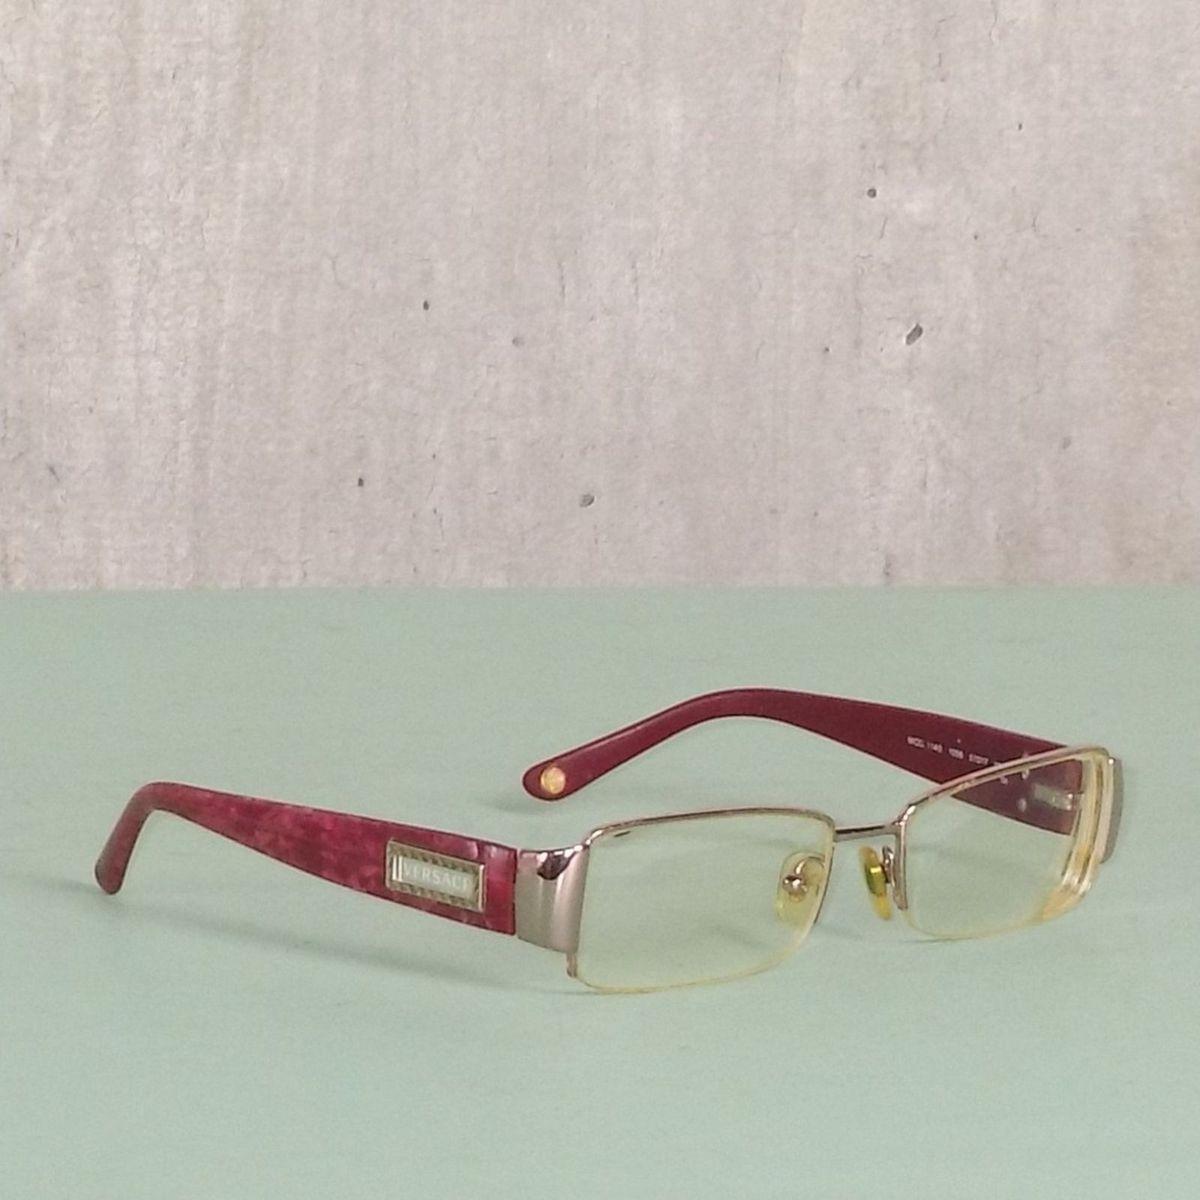 óculos de grau - óculos versace.  Czm6ly9wag90b3muzw5qb2vplmnvbs5ici9wcm9kdwn0cy83mzk0mtqxl2e4mzuwzji5mjdmmdhmotq1ndizytblotllmtm0otmylmpwzw  ... 6417583142